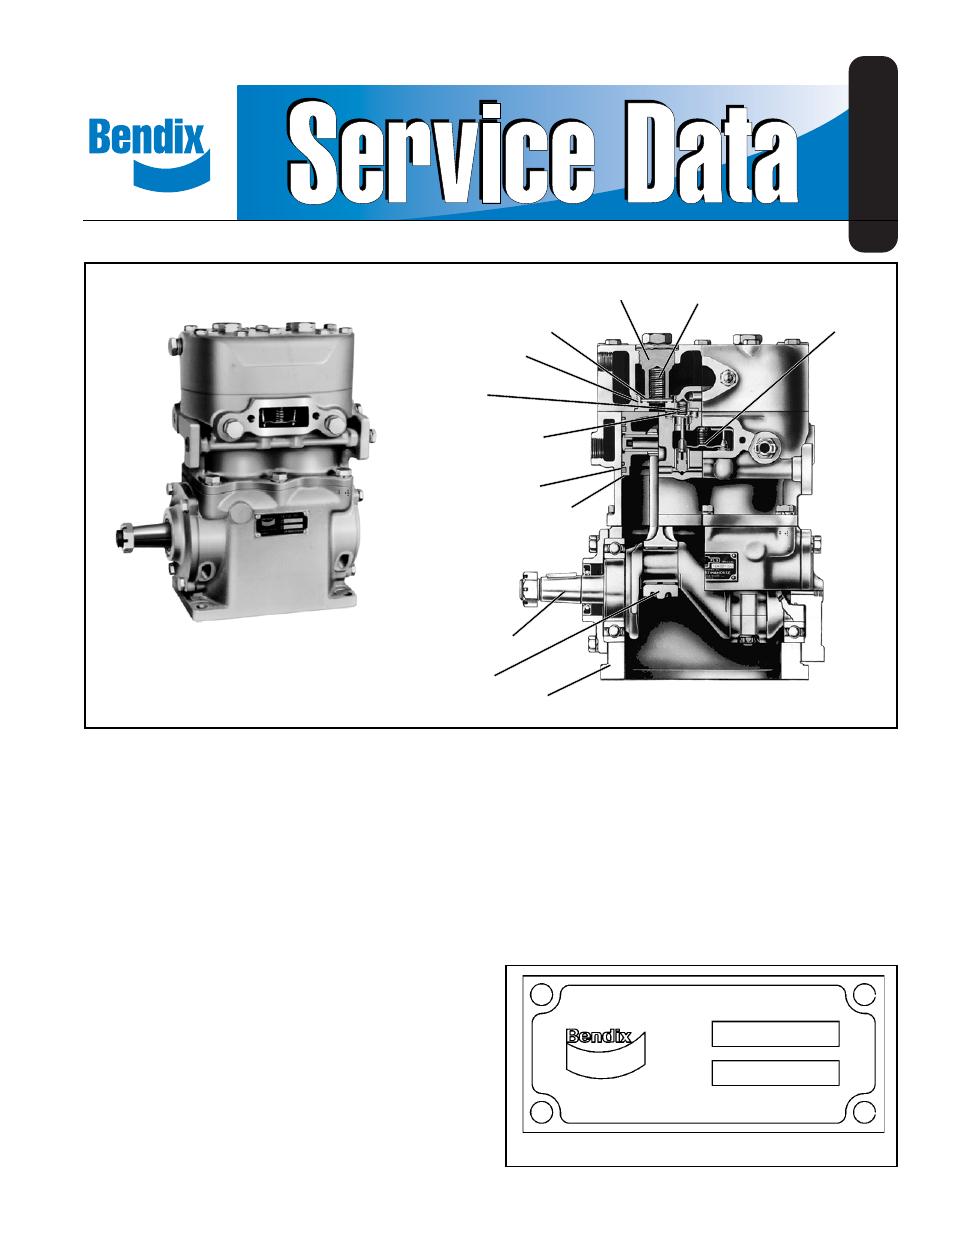 Bendix Commercial Vehicle Systems Tu Flo Compressor Page